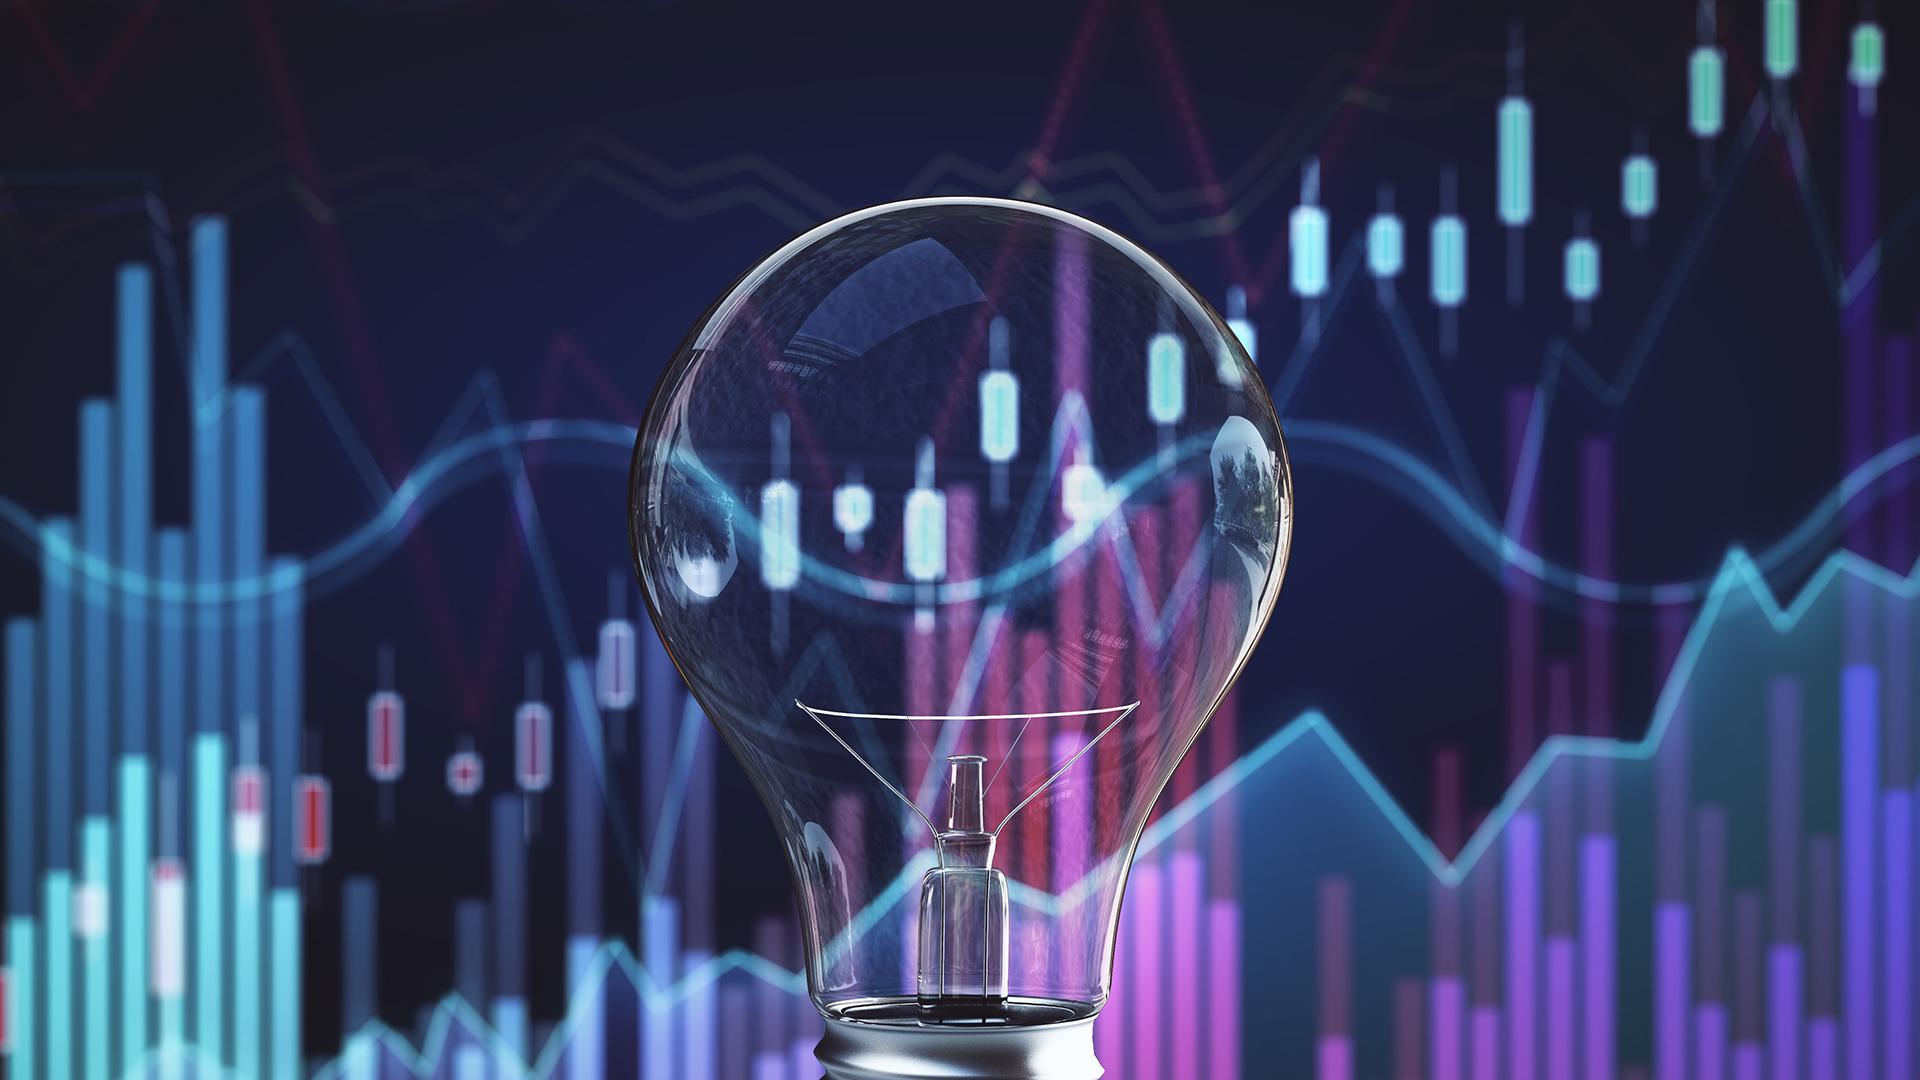 Digital charts with lightbulb